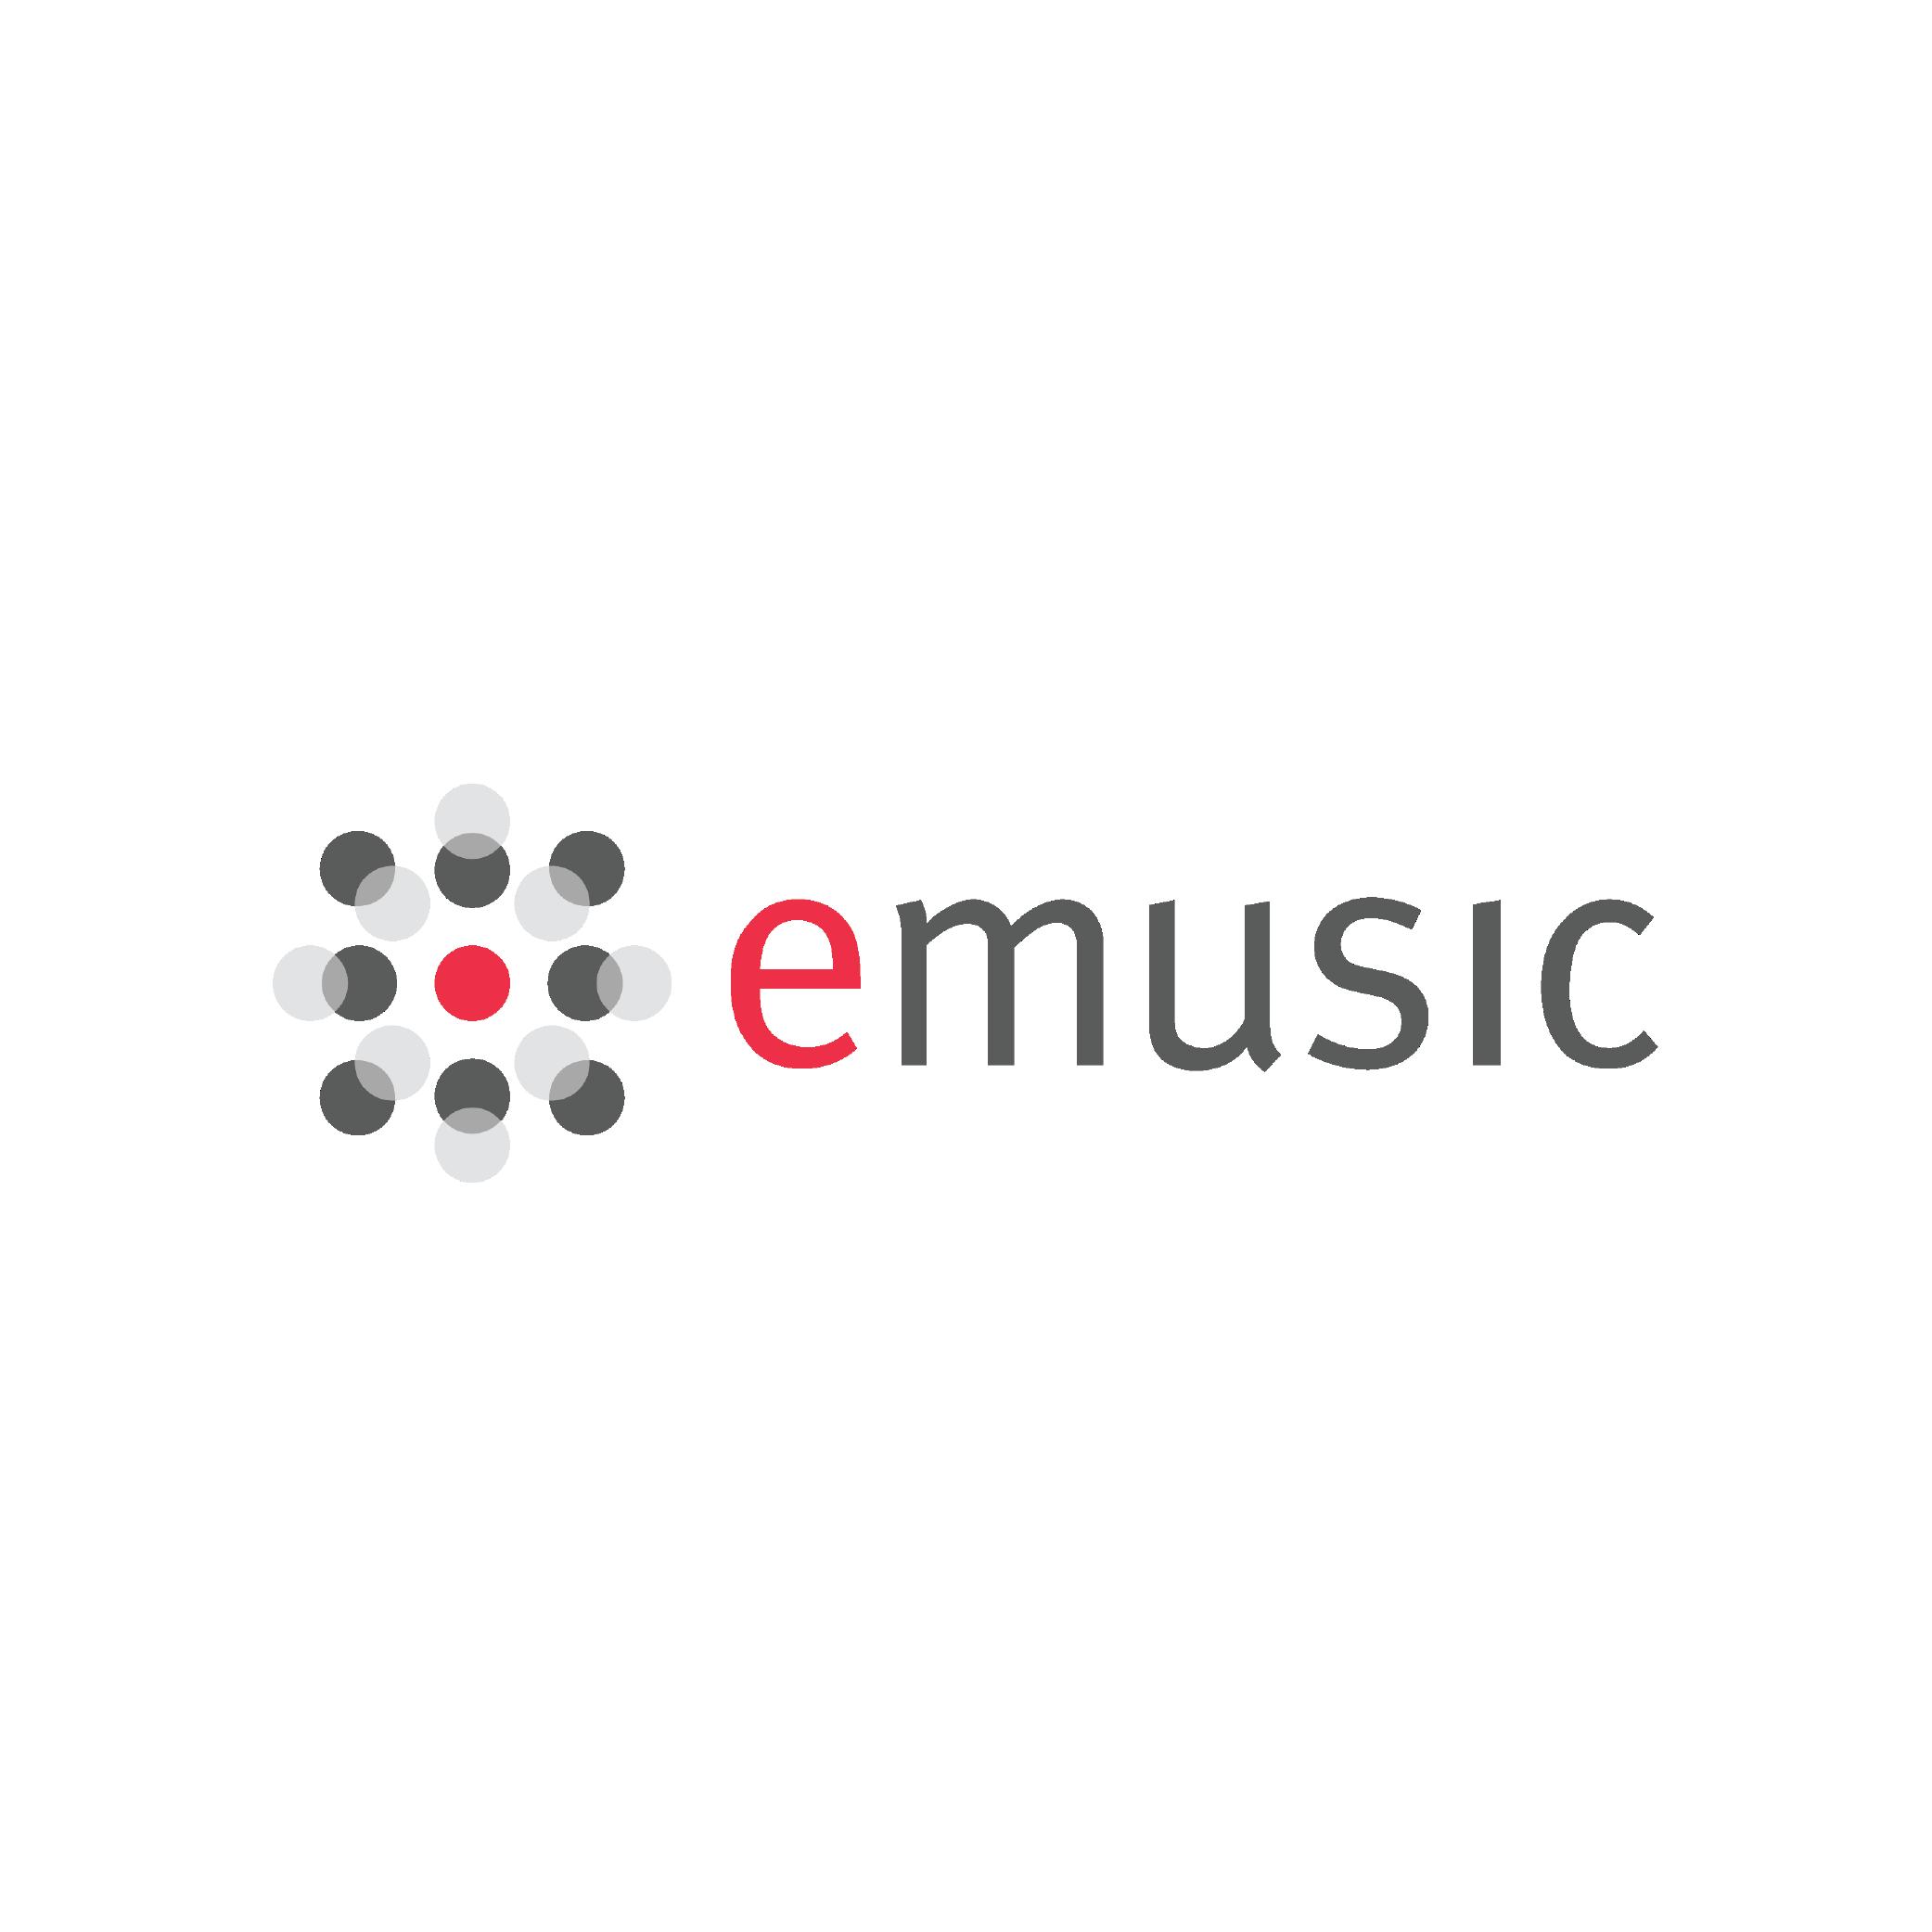 emusic.png